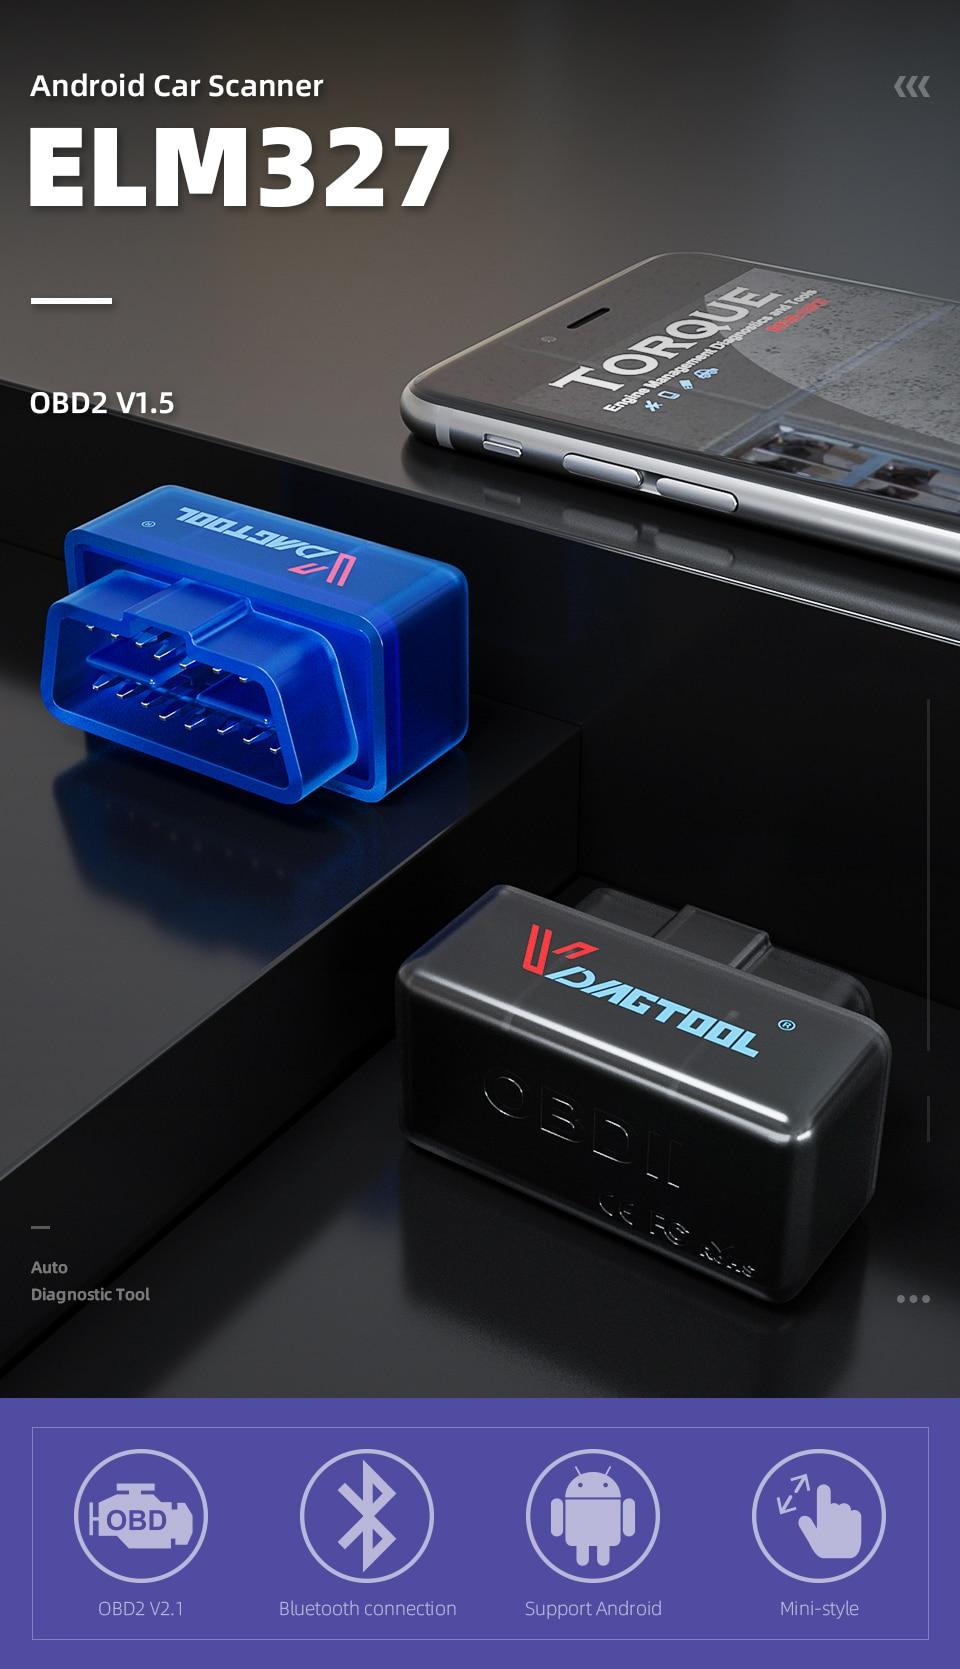 HTB1063meQ9E3KVjSZFGq6A19XXay OBD2 ELM327 V1.5/2.1 Bluetooth Code Reader OBD2 Scanner Automotivo Diagnostic Tool Multi-Language for Android/Symbian